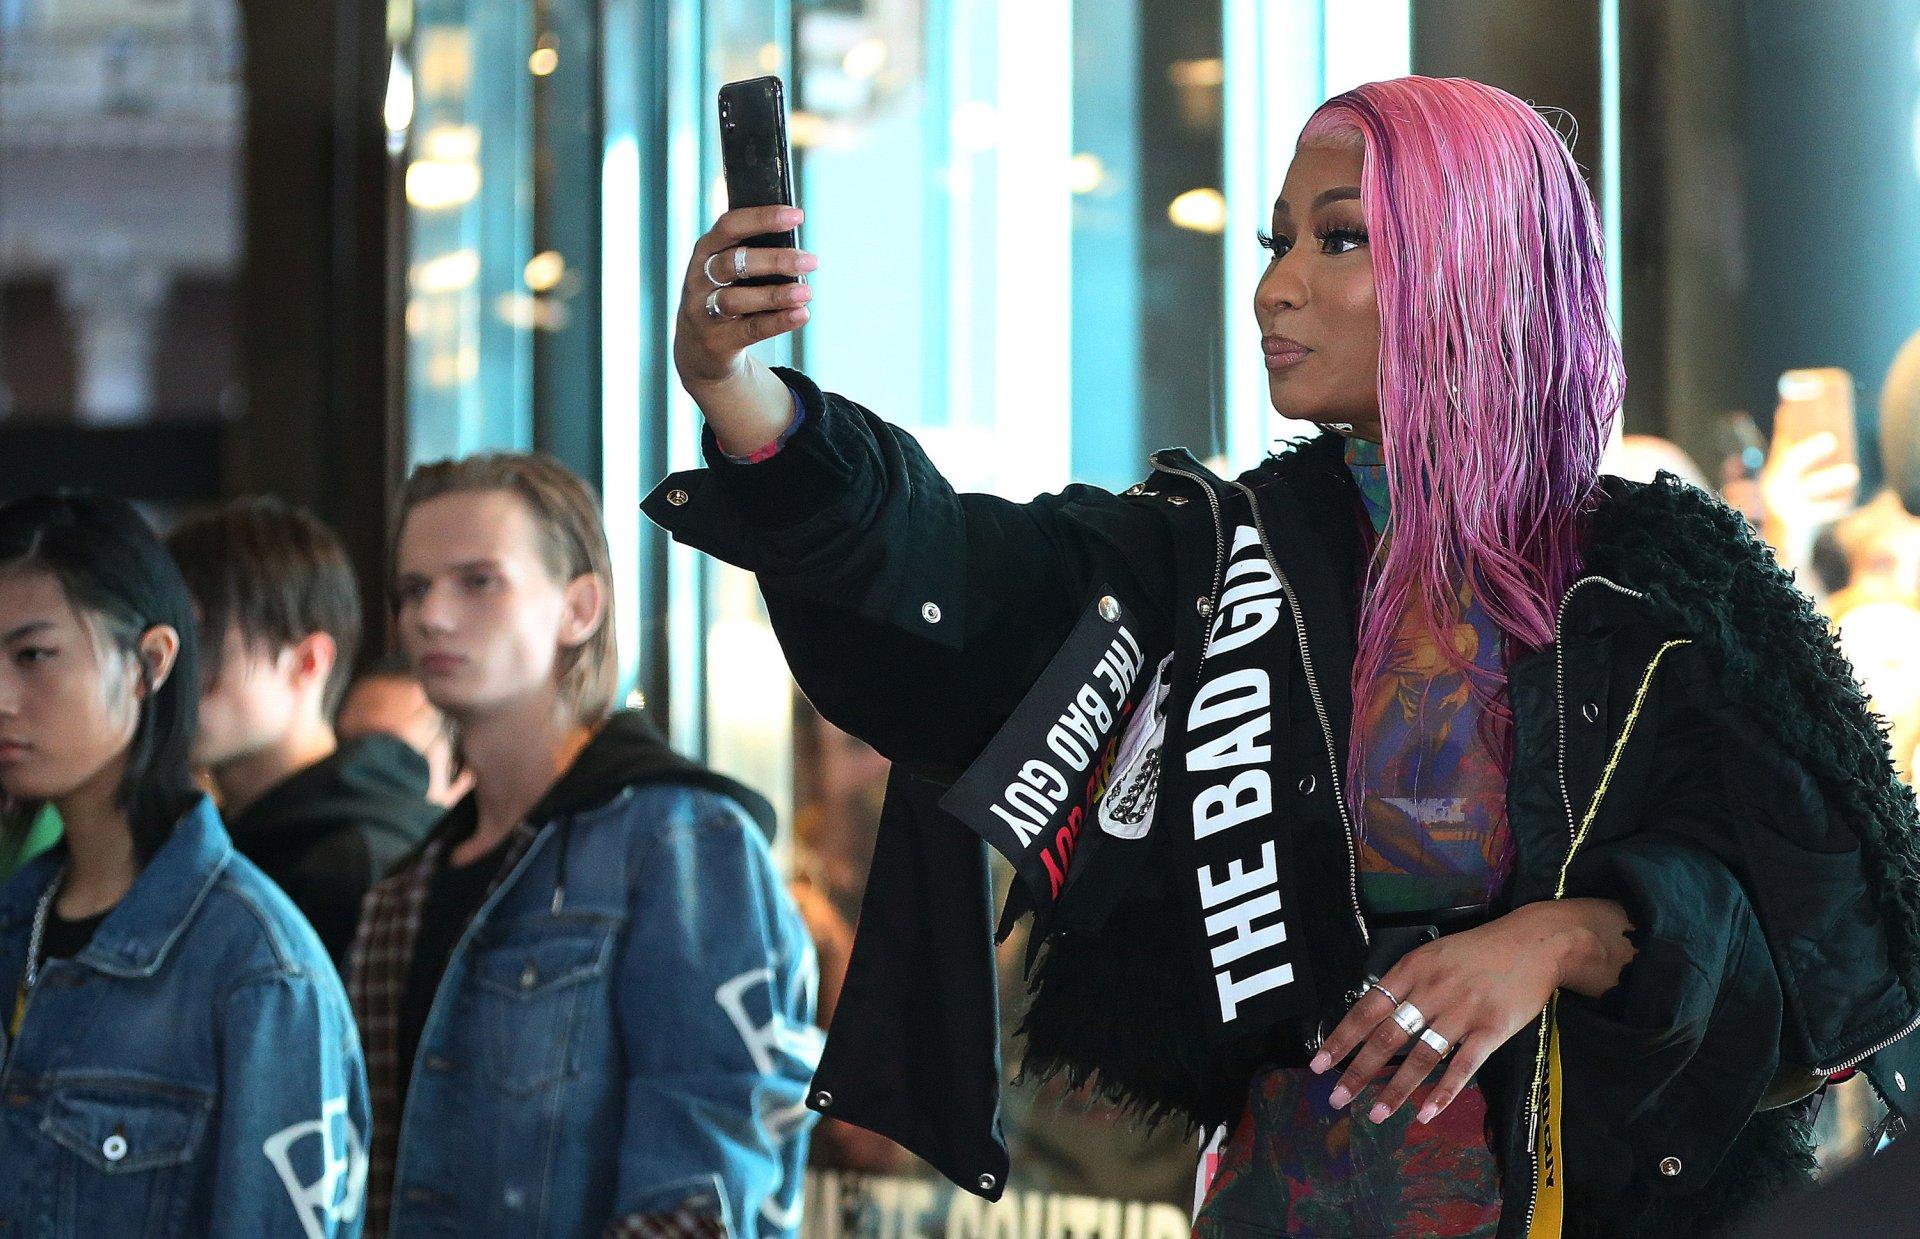 Nicki-Minaj-See-Through-TheFappeningBlog.com-58.jpg